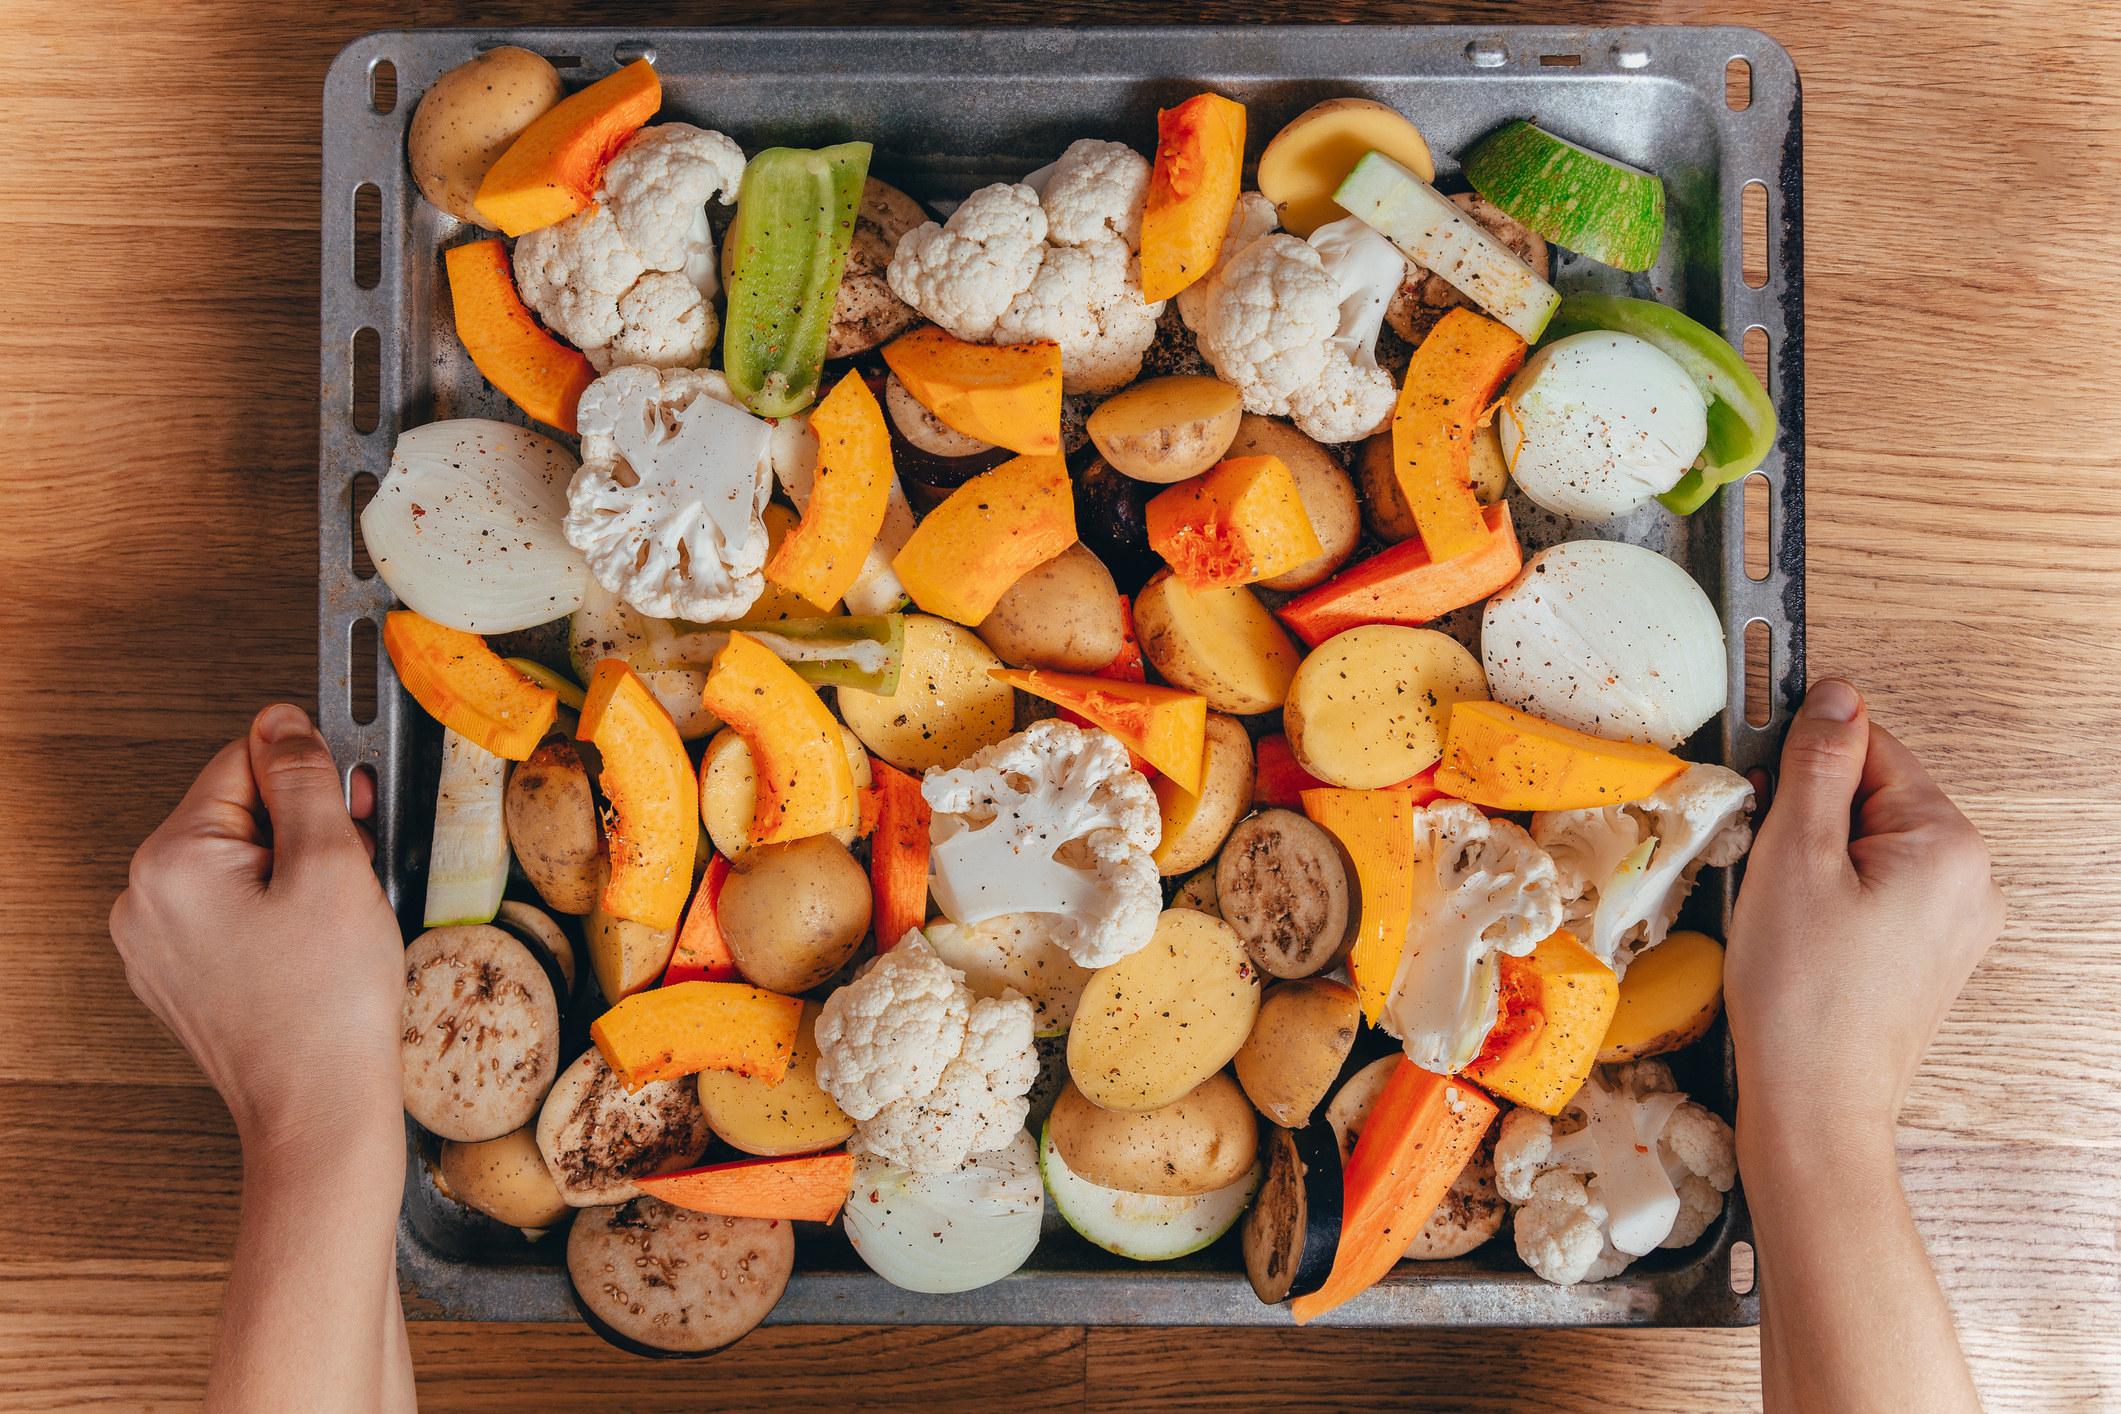 Roasting vegetables.